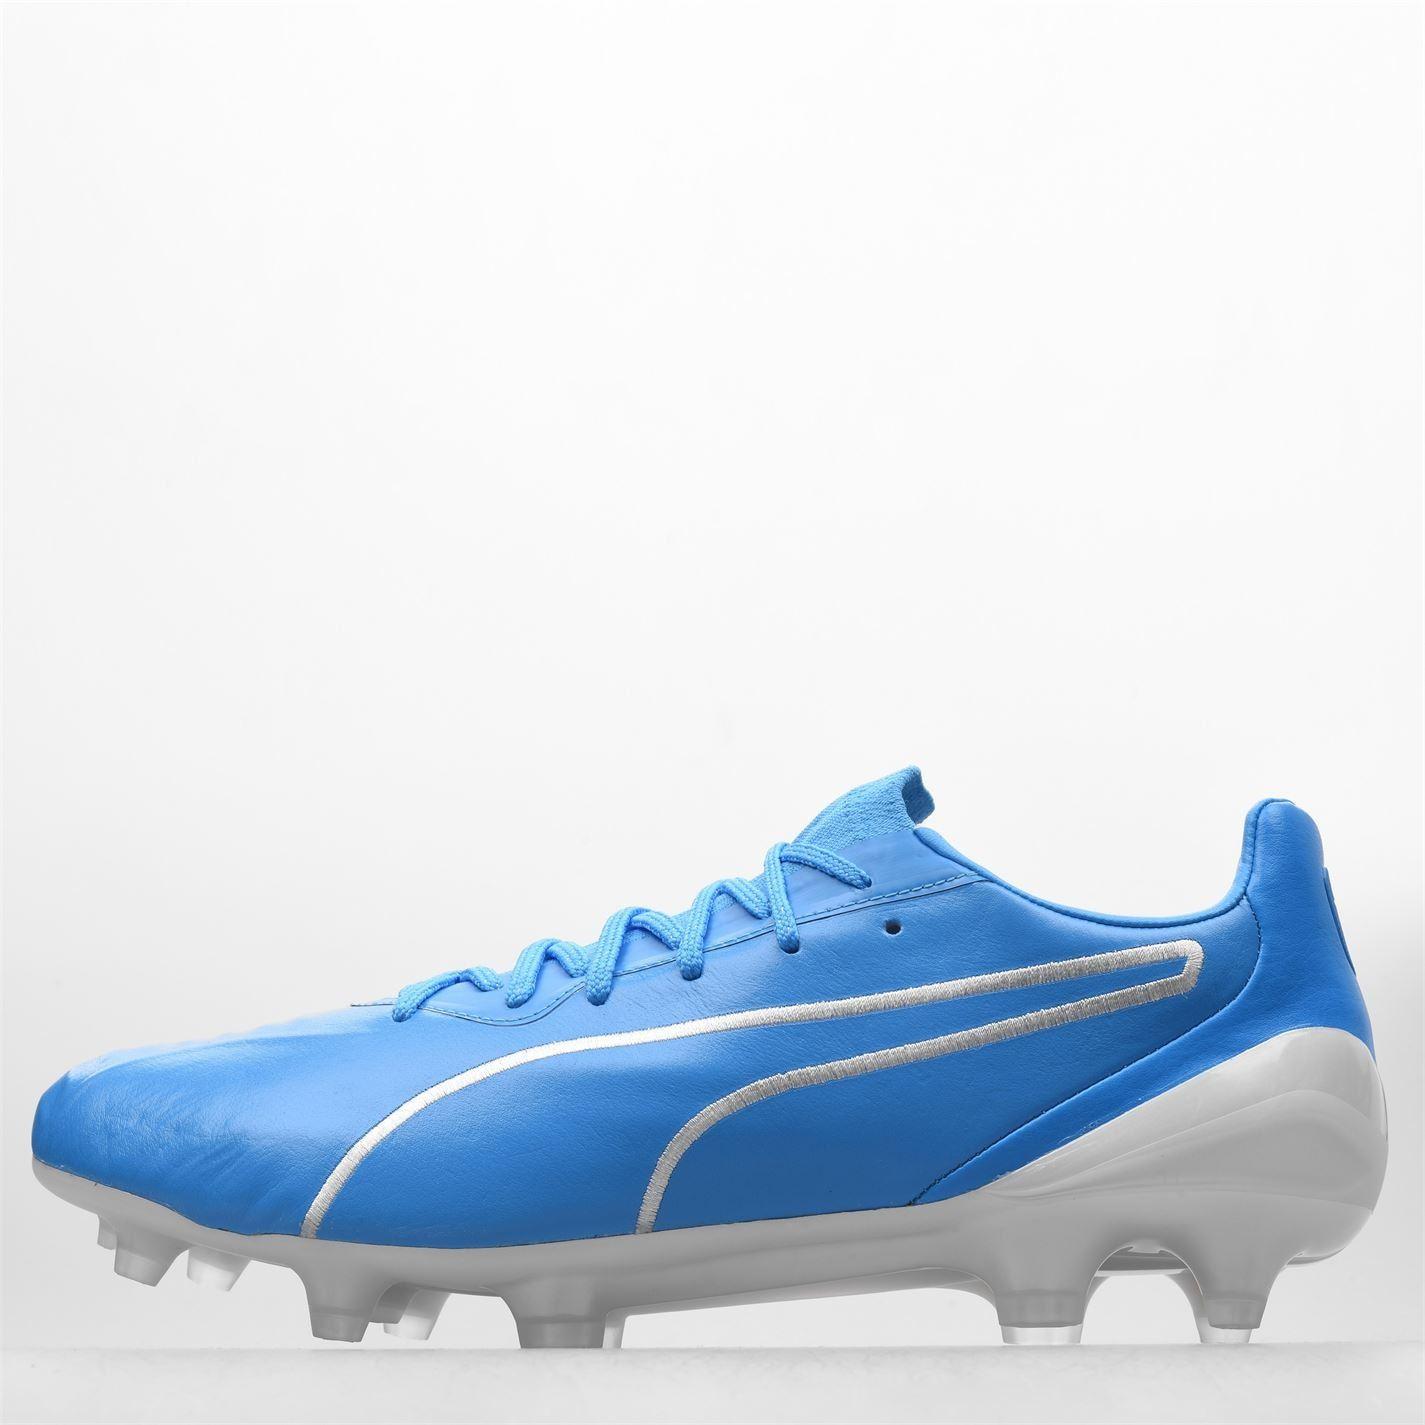 miniature 6 - Puma-King-FG-Firm-Ground-Football-Bottes-Homme-Chaussures-De-Foot-Crampons-Baskets